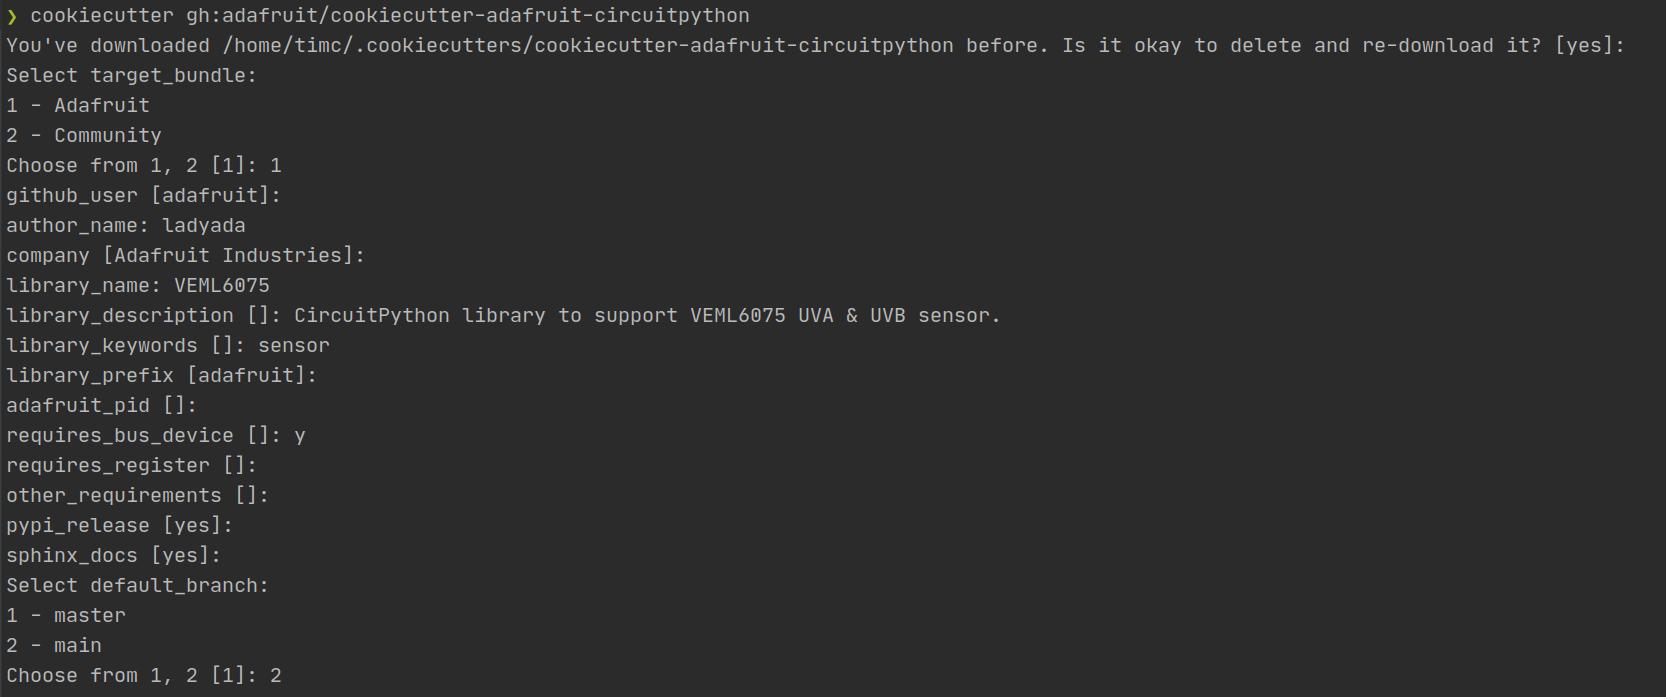 circuitpython_cookie_cutter_run.png